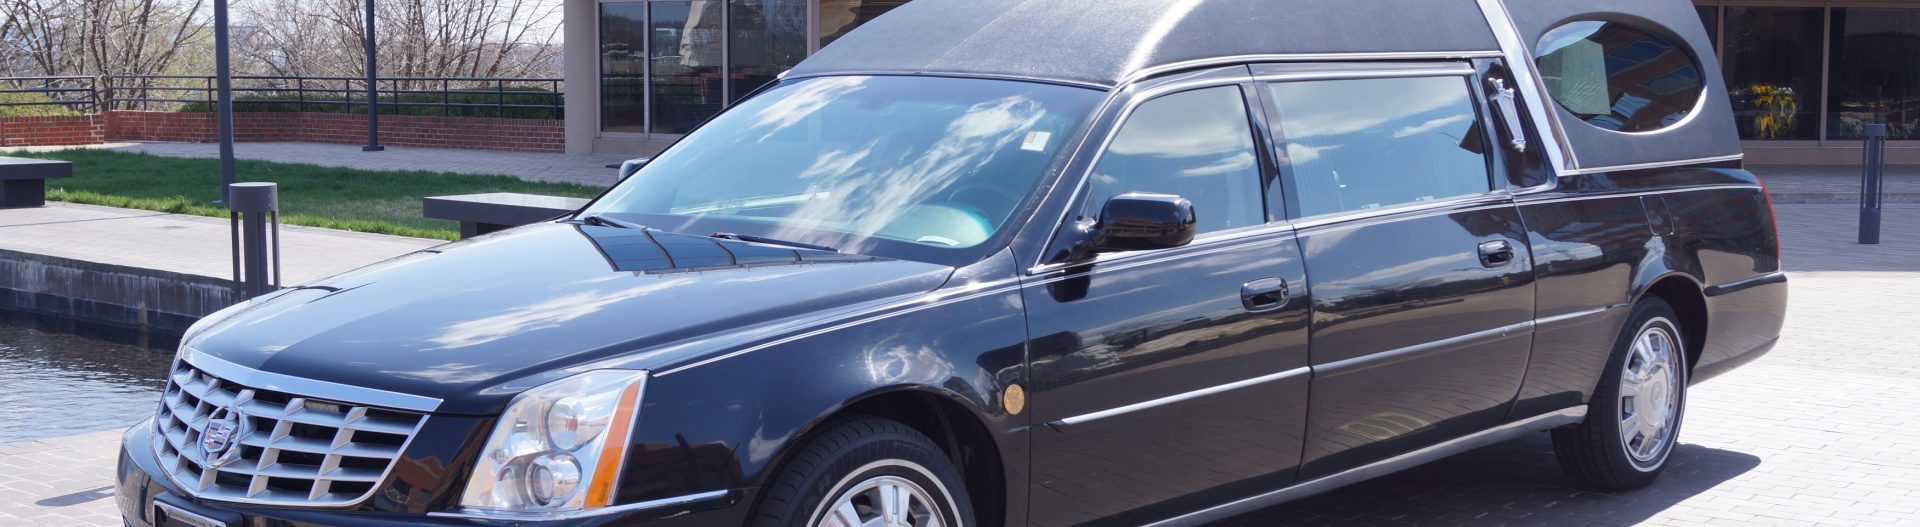 2010 Hearse Cadillac Federal Heritage